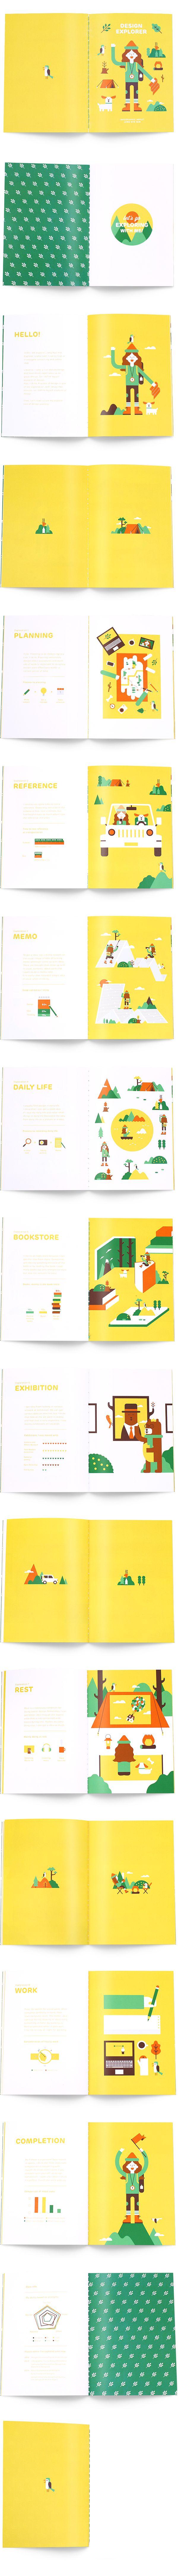 Design Explorer - Infographic & Illustration about me on Behance